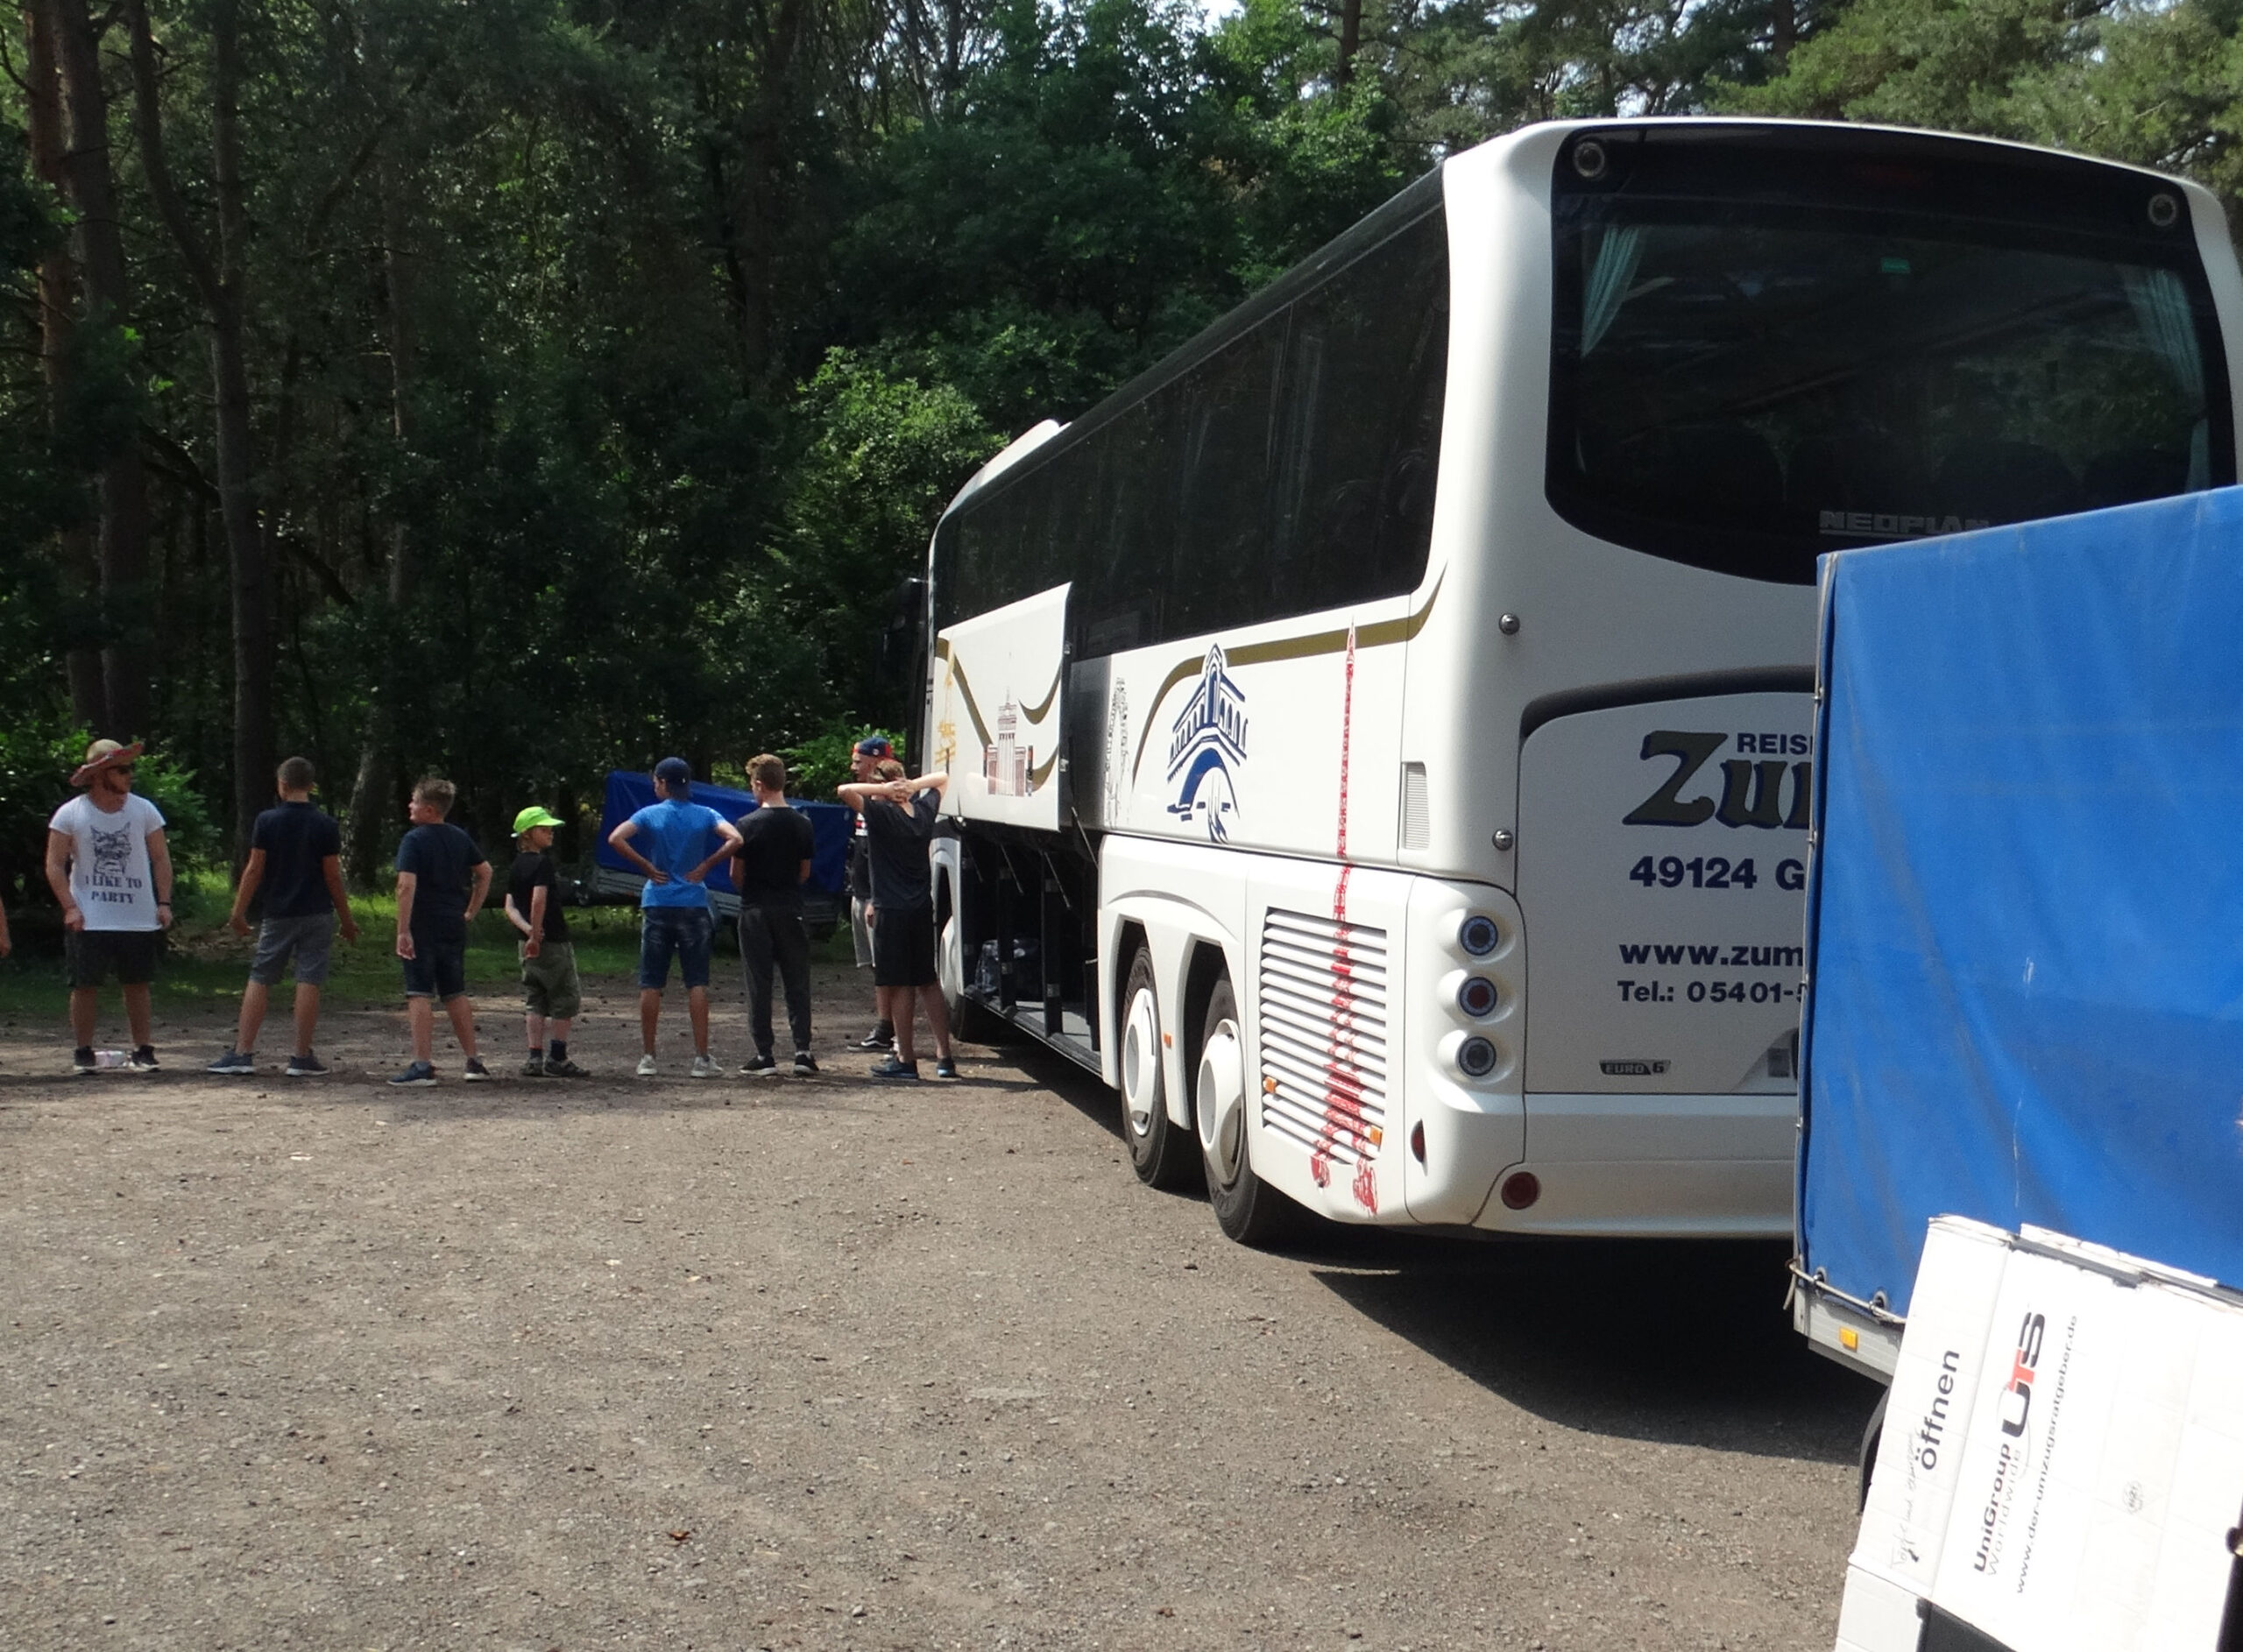 Reisebus in Hasenheide